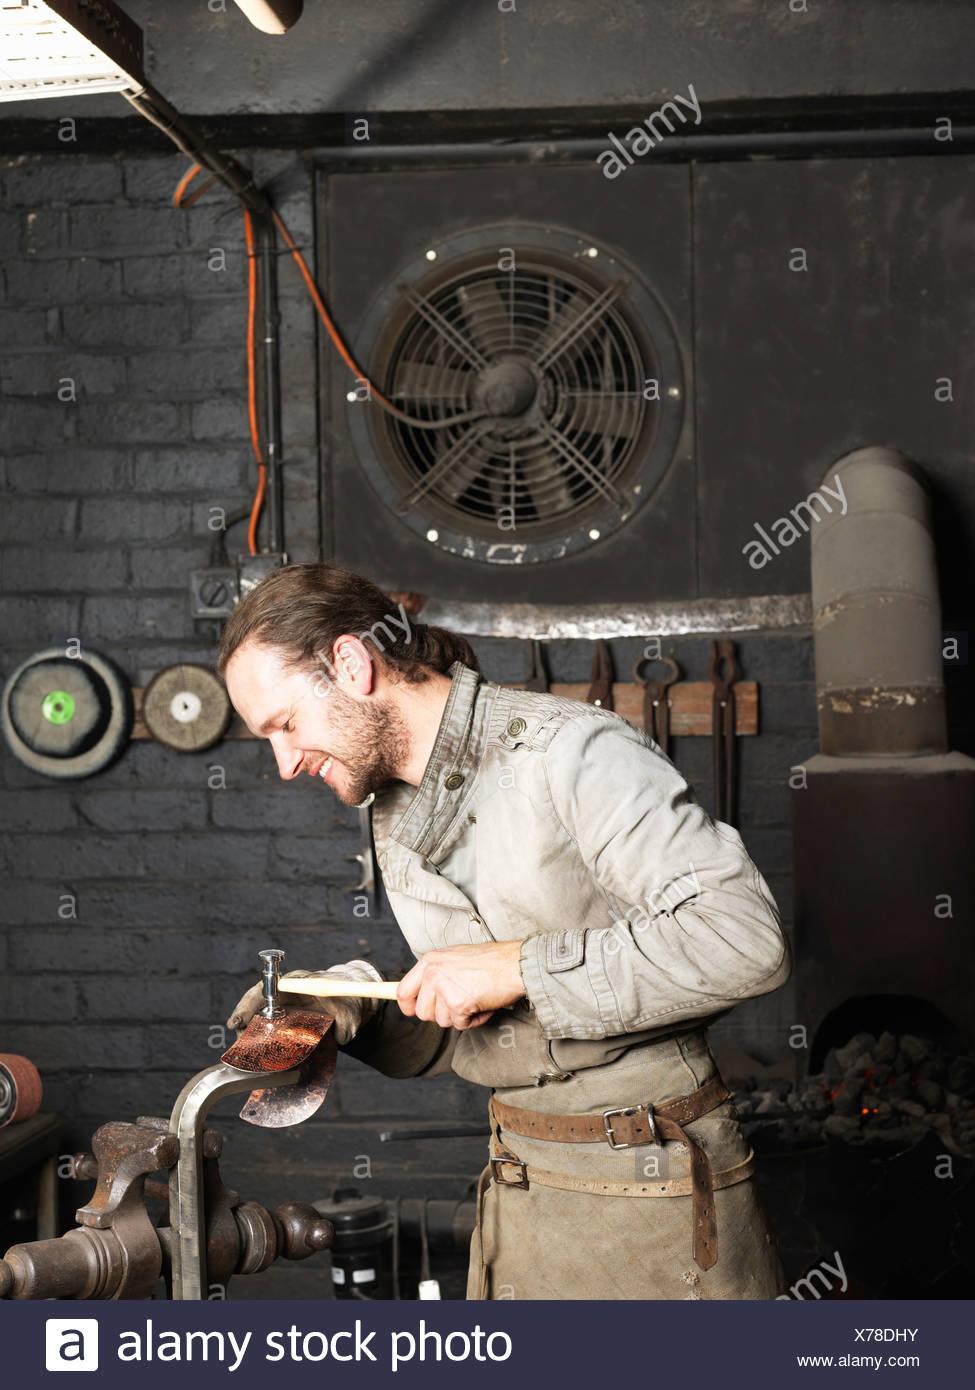 Blacksmith hammering cuivre dans l'atelier Photo Stock